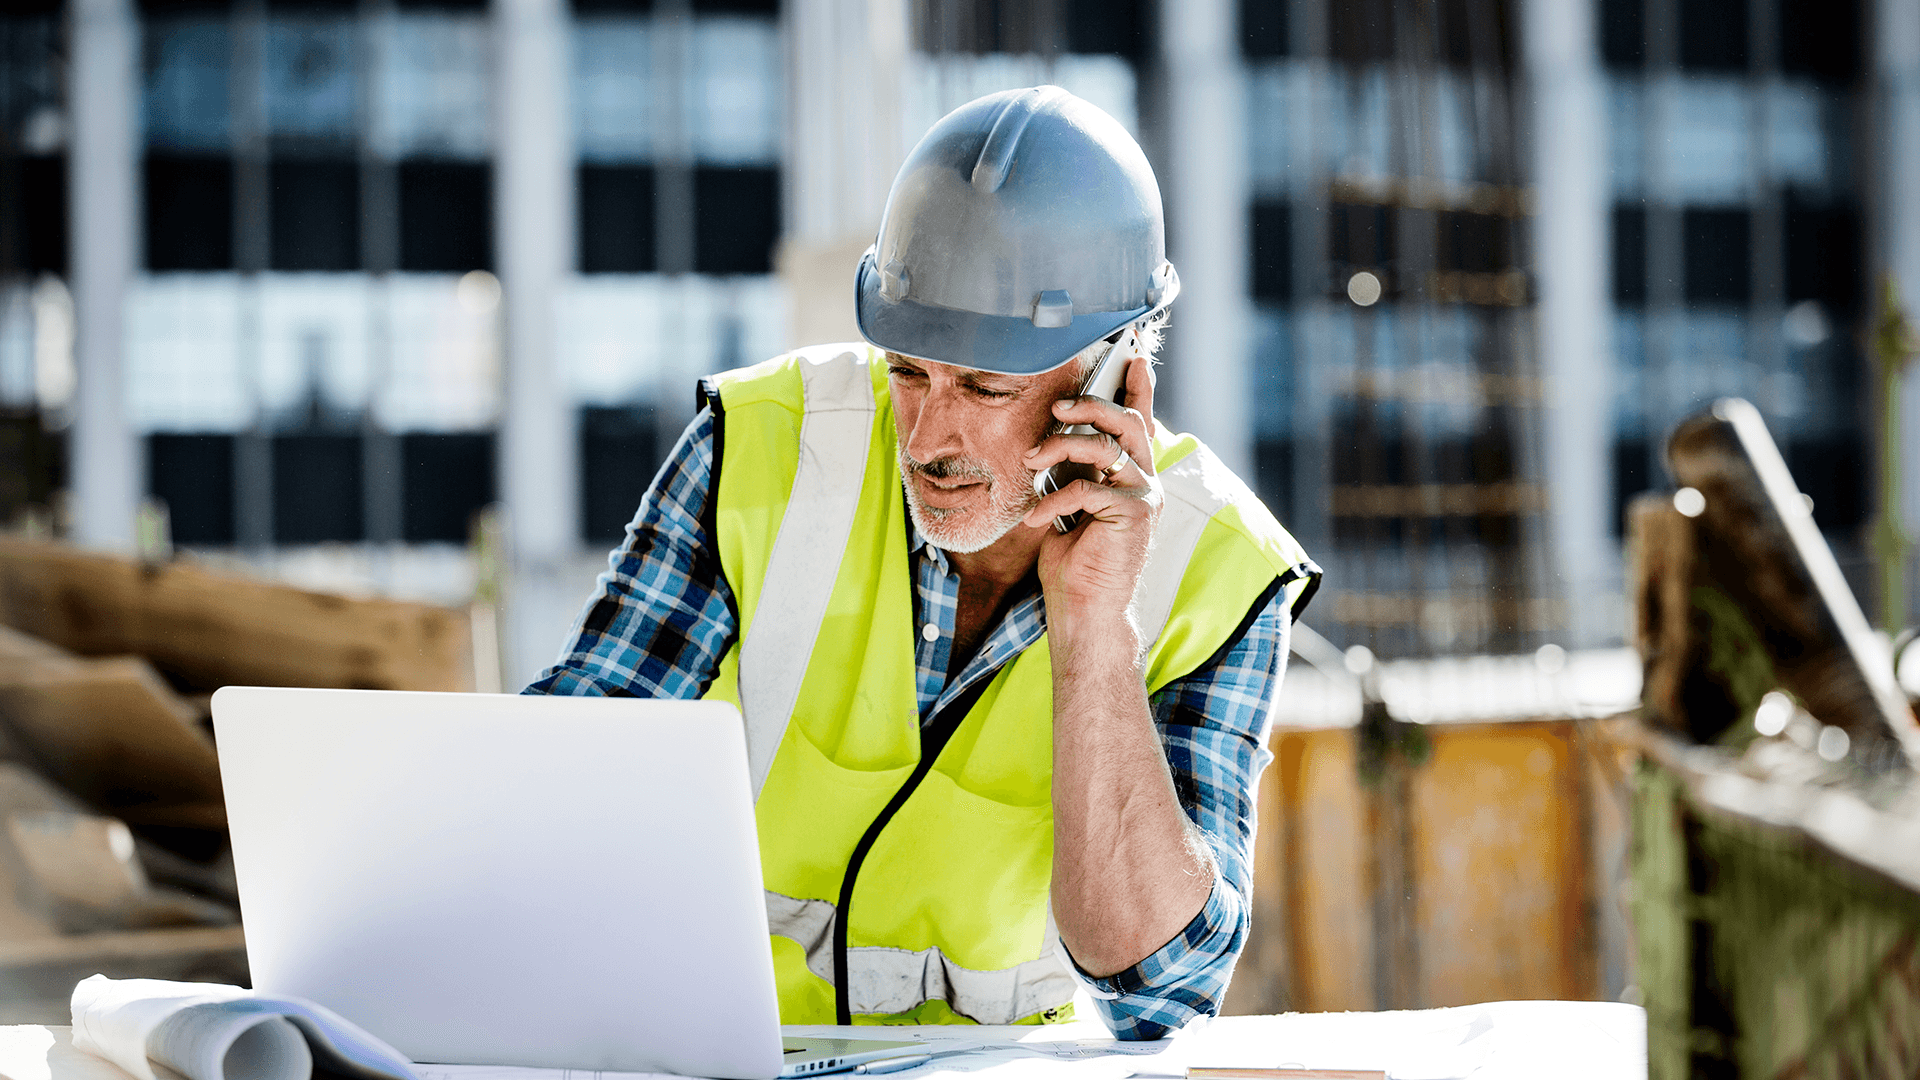 Webinar: An Introduction to Supplier Management